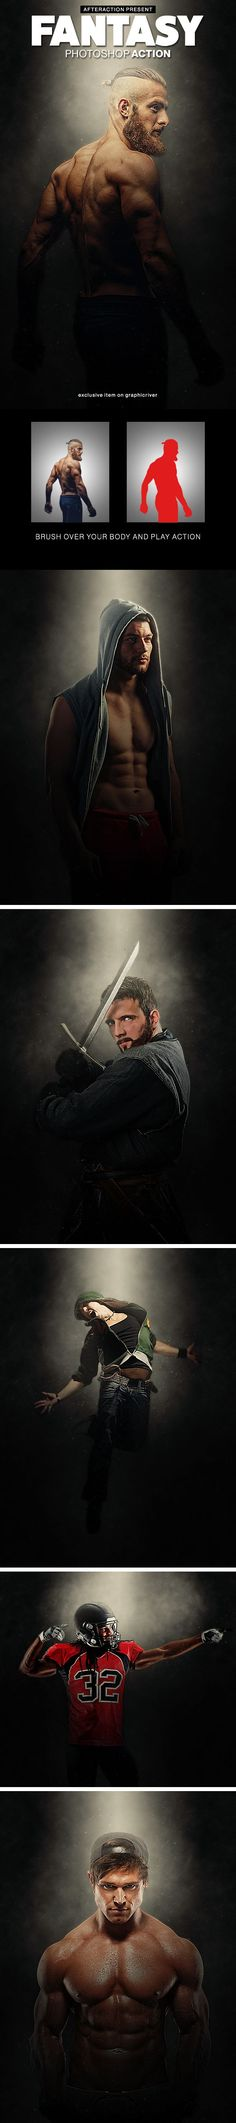 Fantasy Photoshop Action — Photoshop ATN #legend #action